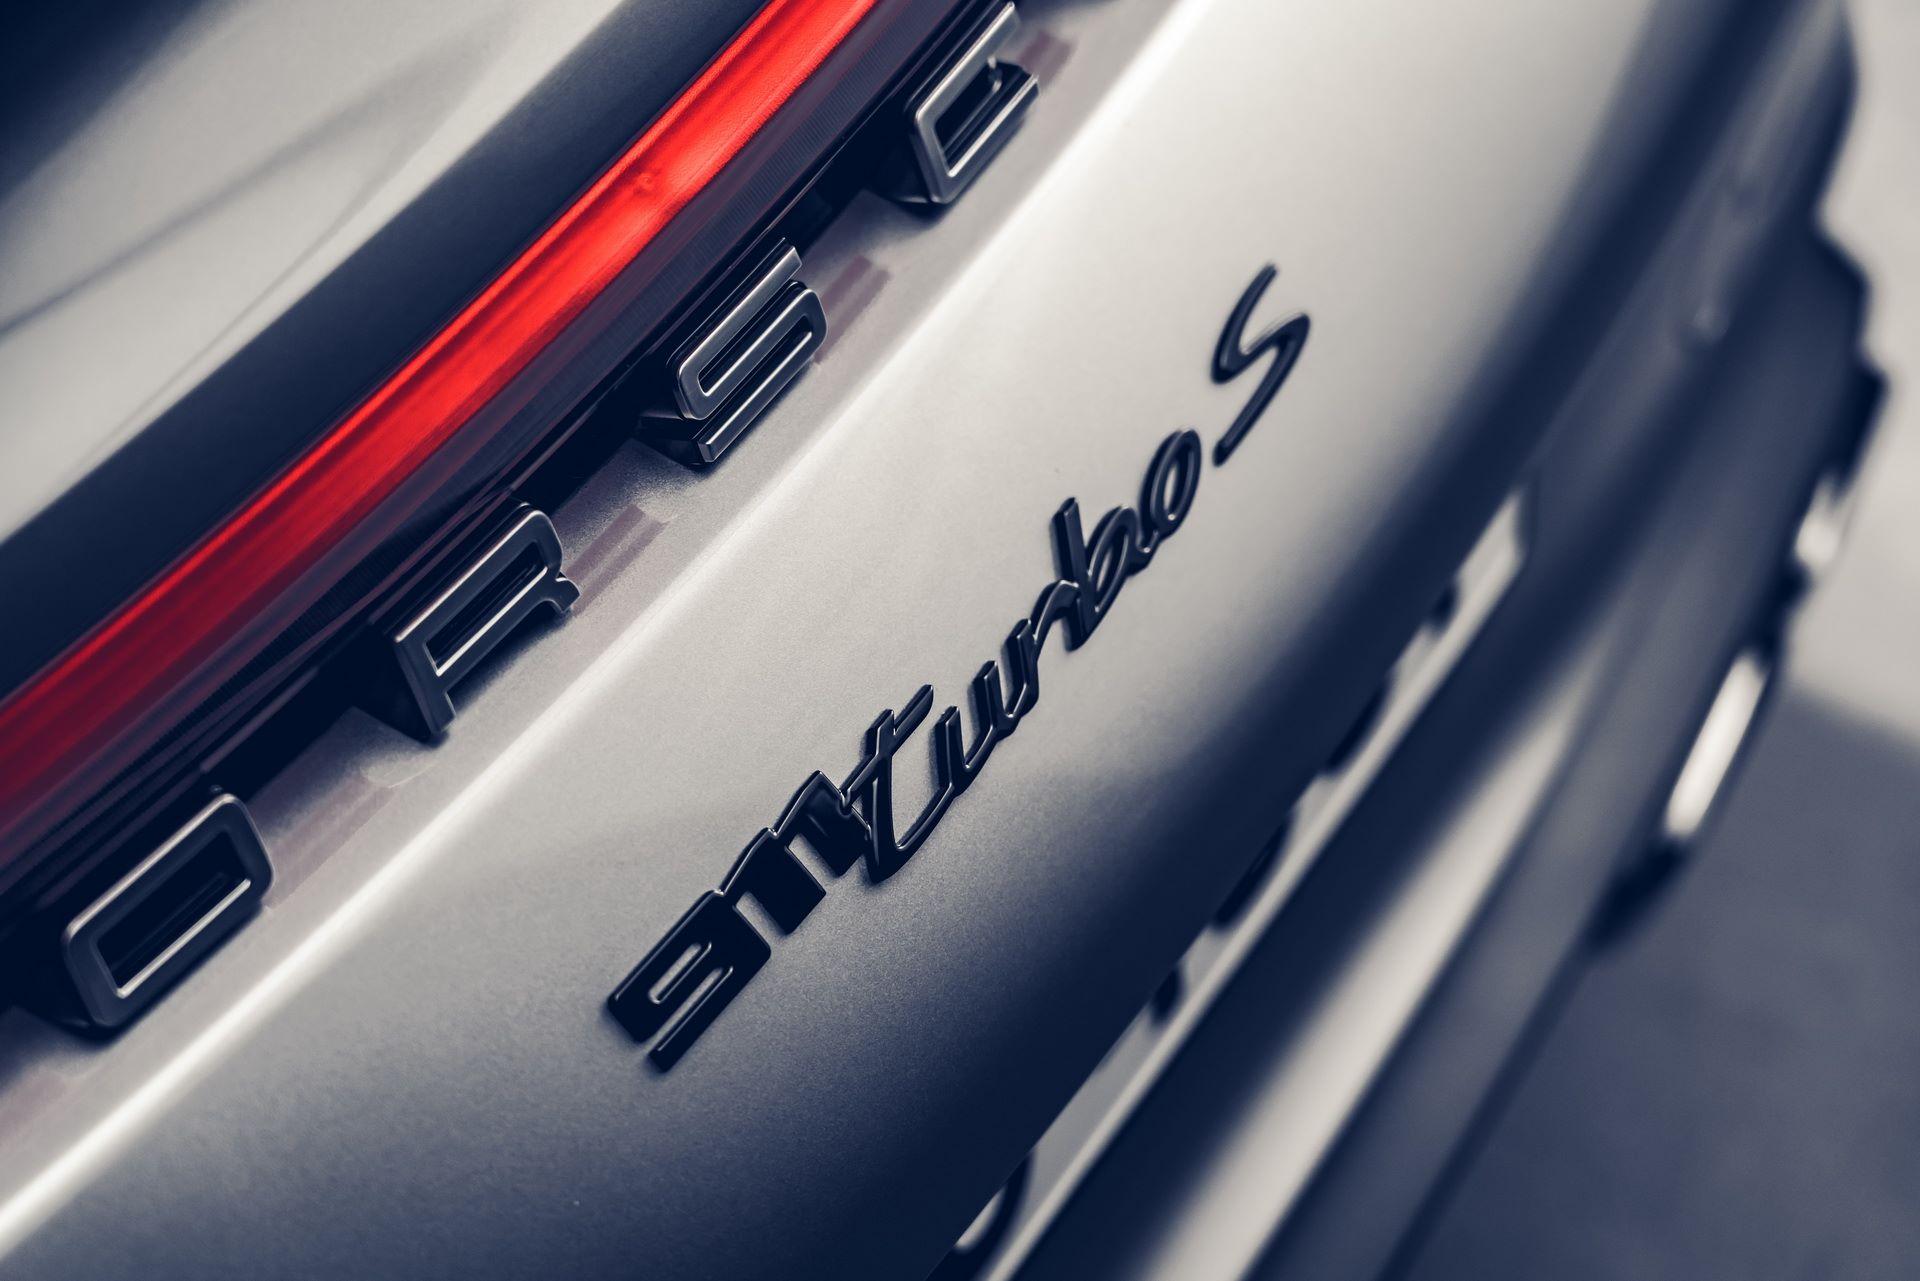 Porsche-911-Turbo-S-2020-44